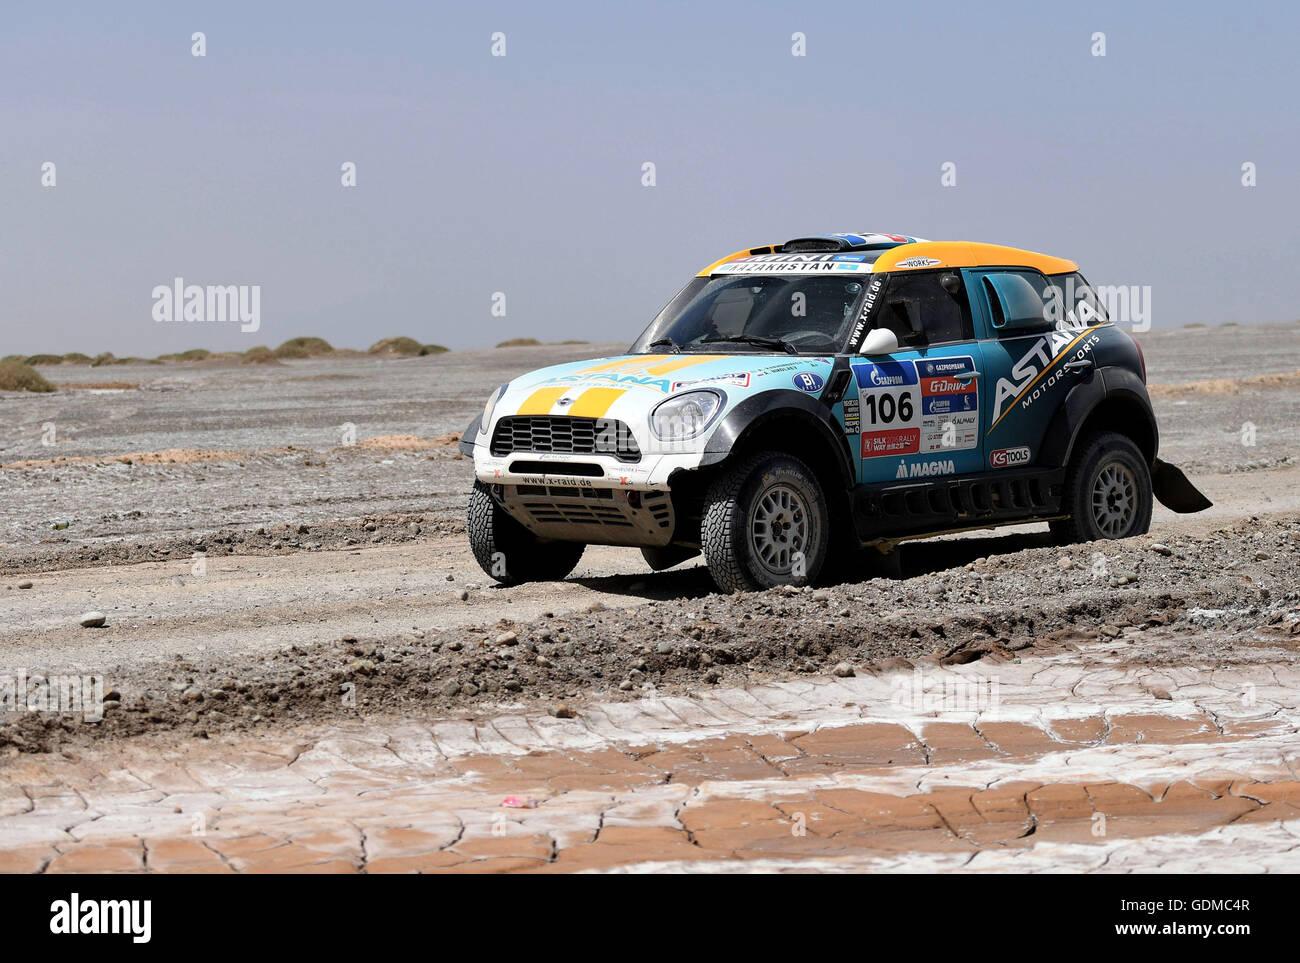 Dunhuang, China's Gansu Province. 19th July, 2016. ASTANA Motorsport's driver Aidyn Rakhimbayev and co-driver - Stock Image